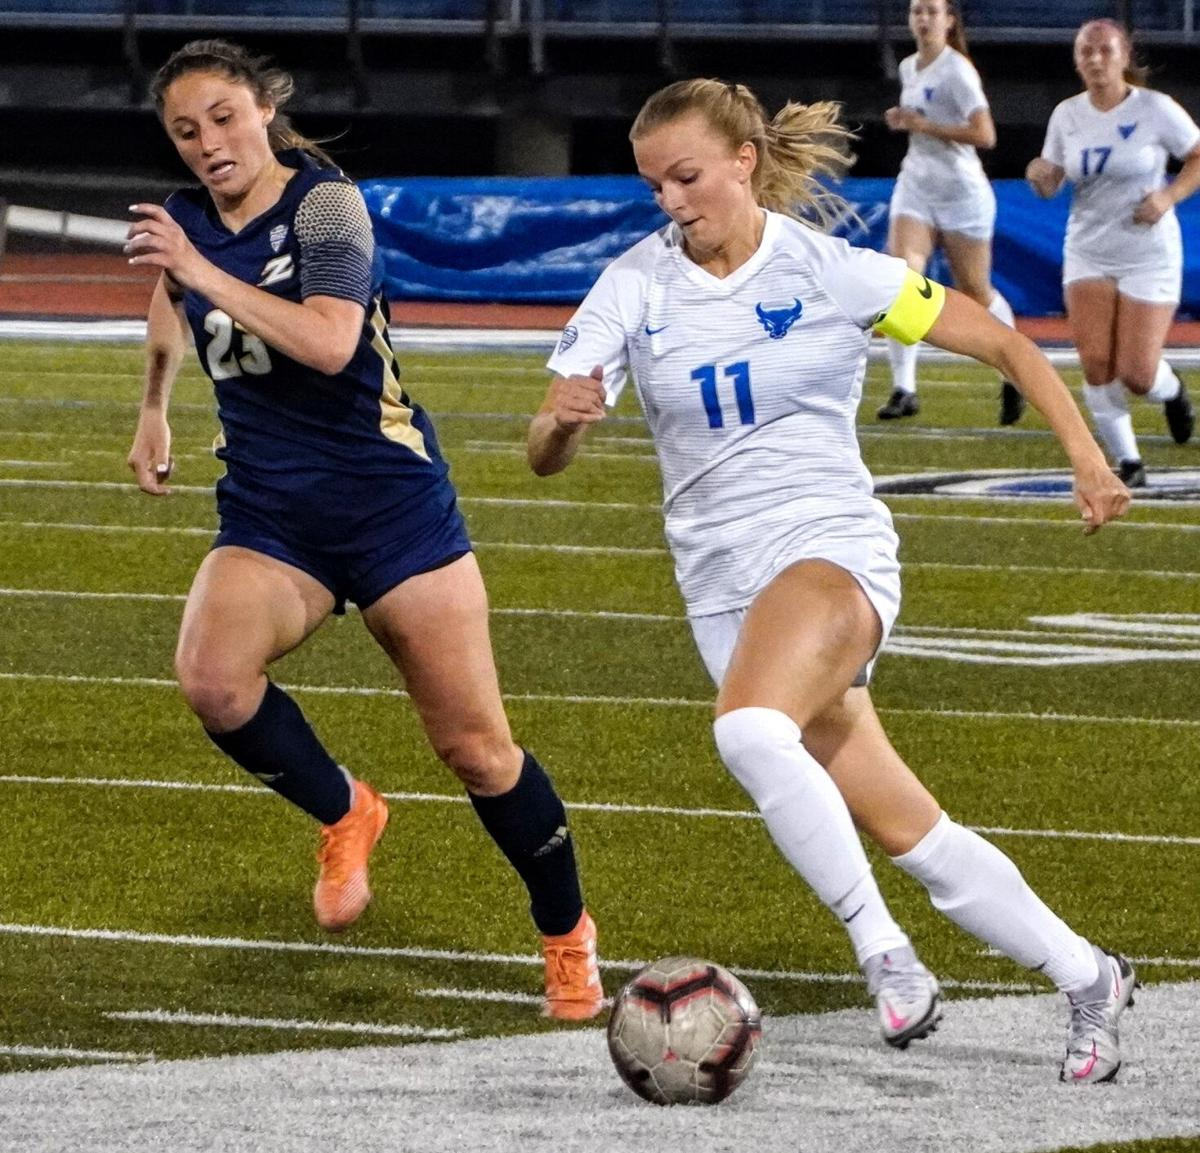 Marcy Barberic UB women's soccer